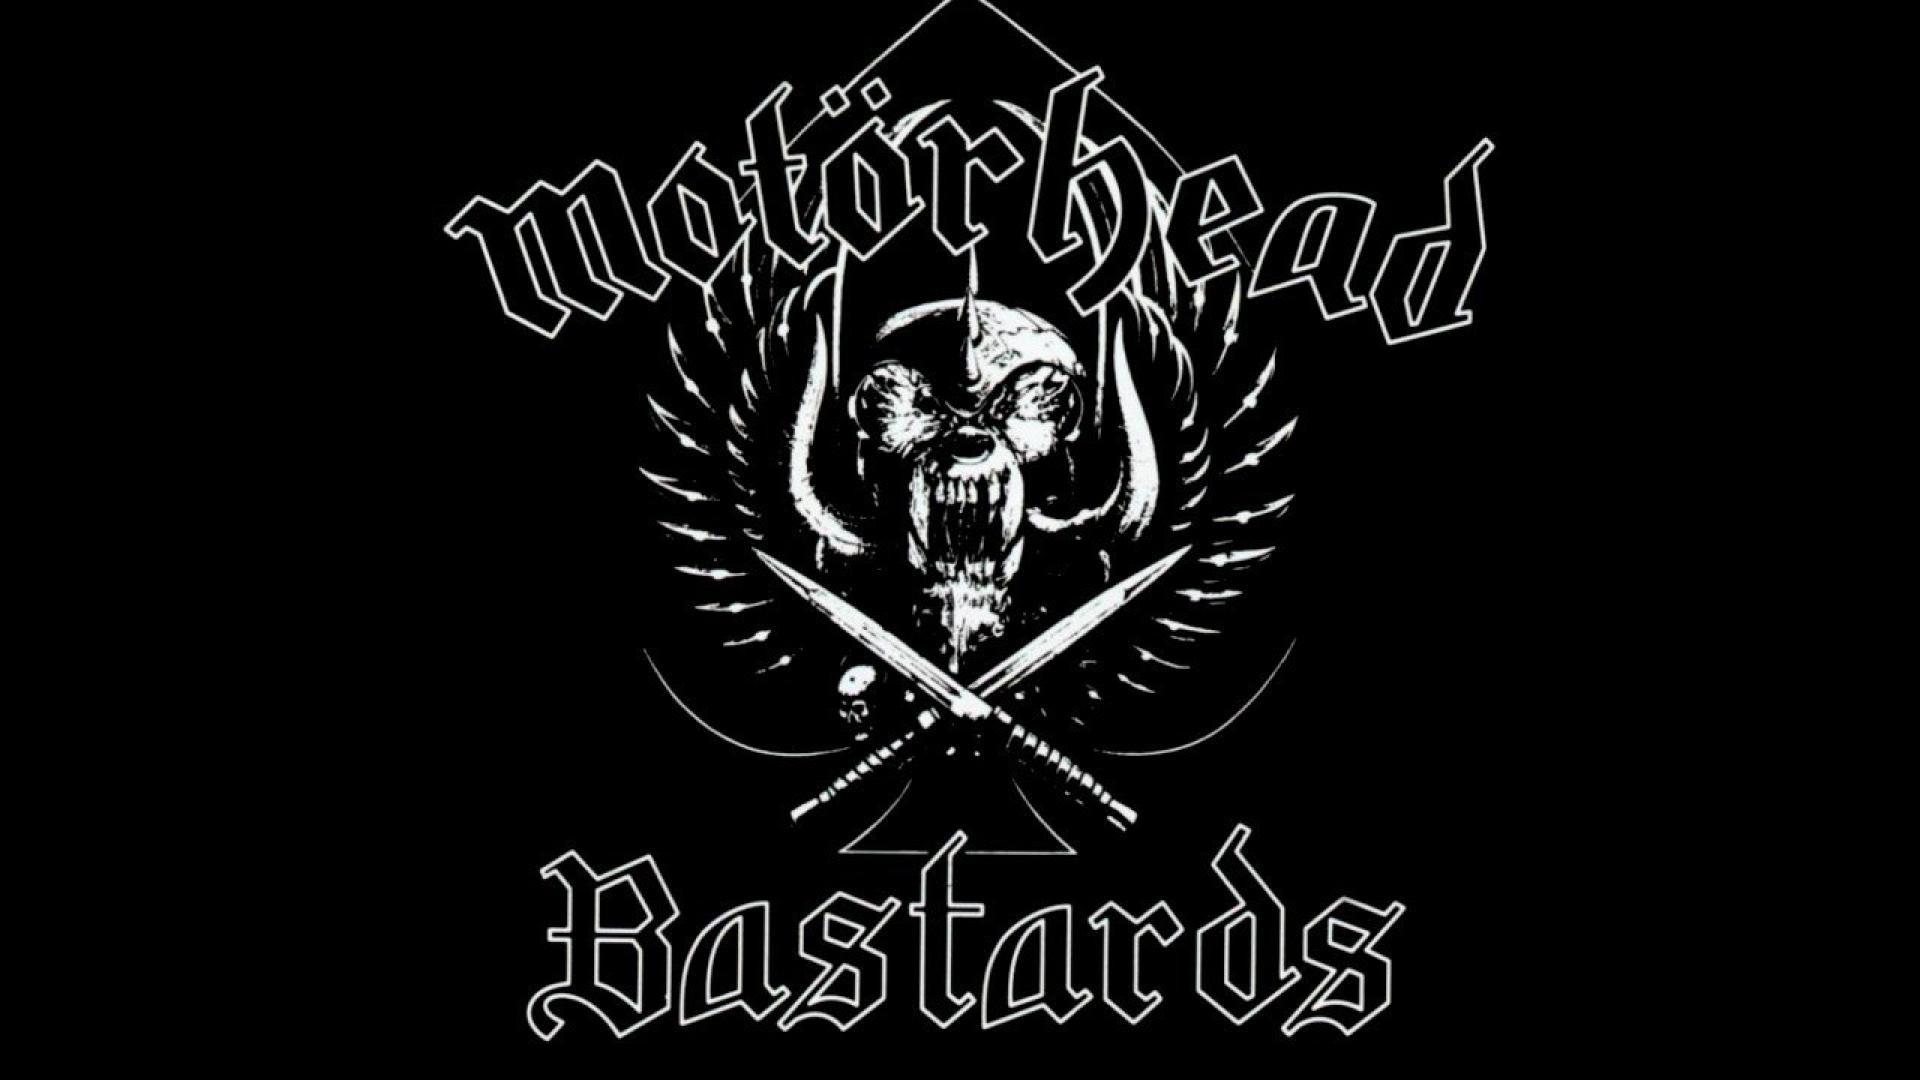 1920x1080 Motorhead Music Heavy Metal Wallpaper